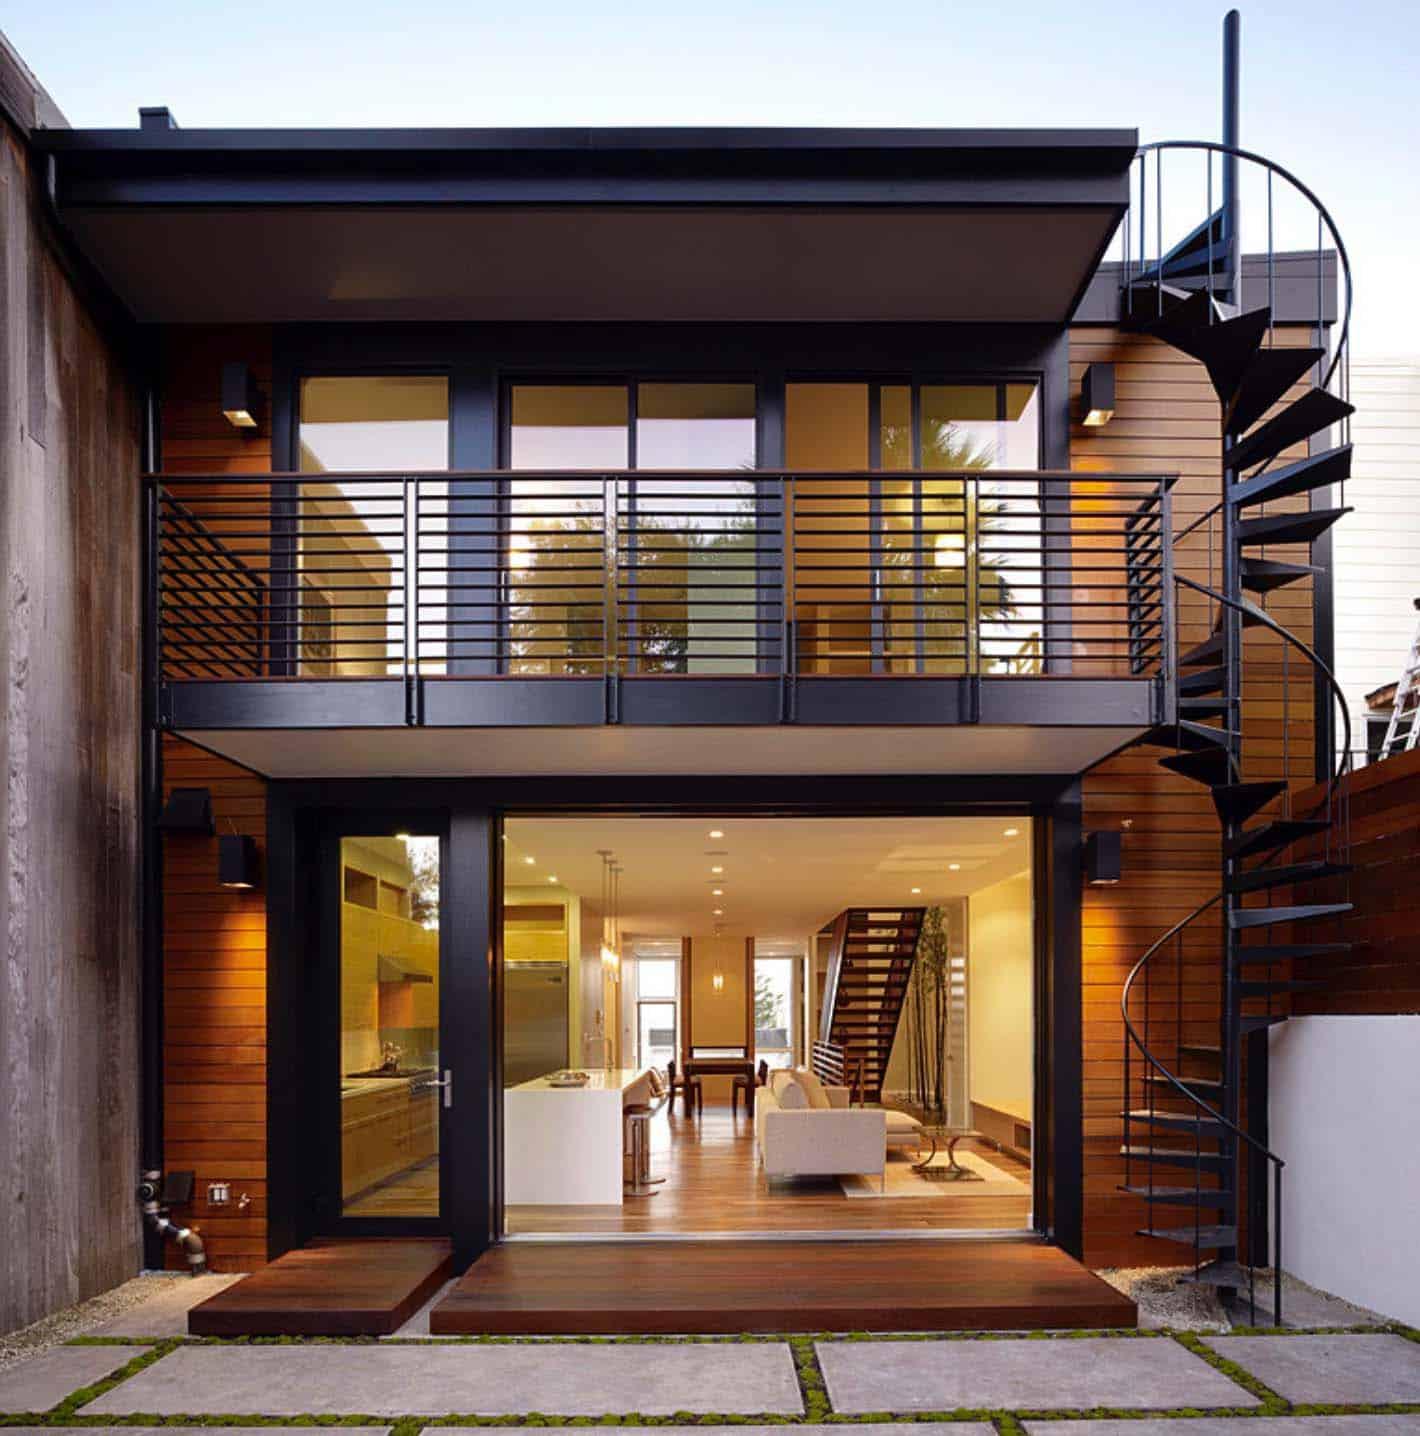 Architecture Modern Hillside Home-02-1 Kindesign